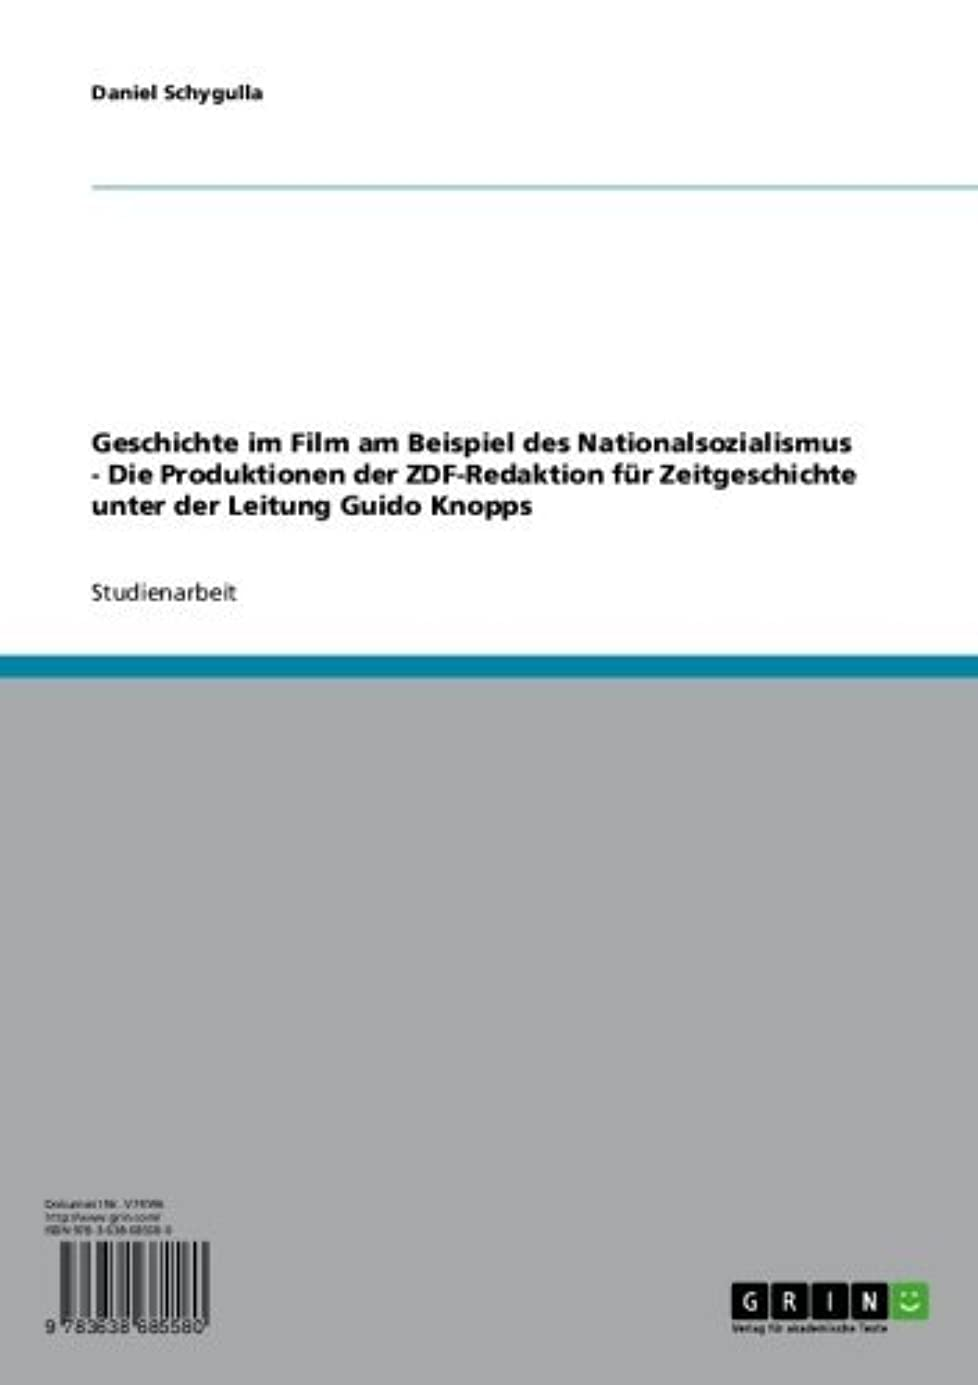 蒸発作物以来Geschichte im Film am Beispiel des Nationalsozialismus - Die Produktionen der ZDF-Redaktion für Zeitgeschichte unter der Leitung Guido Knopps (German Edition)